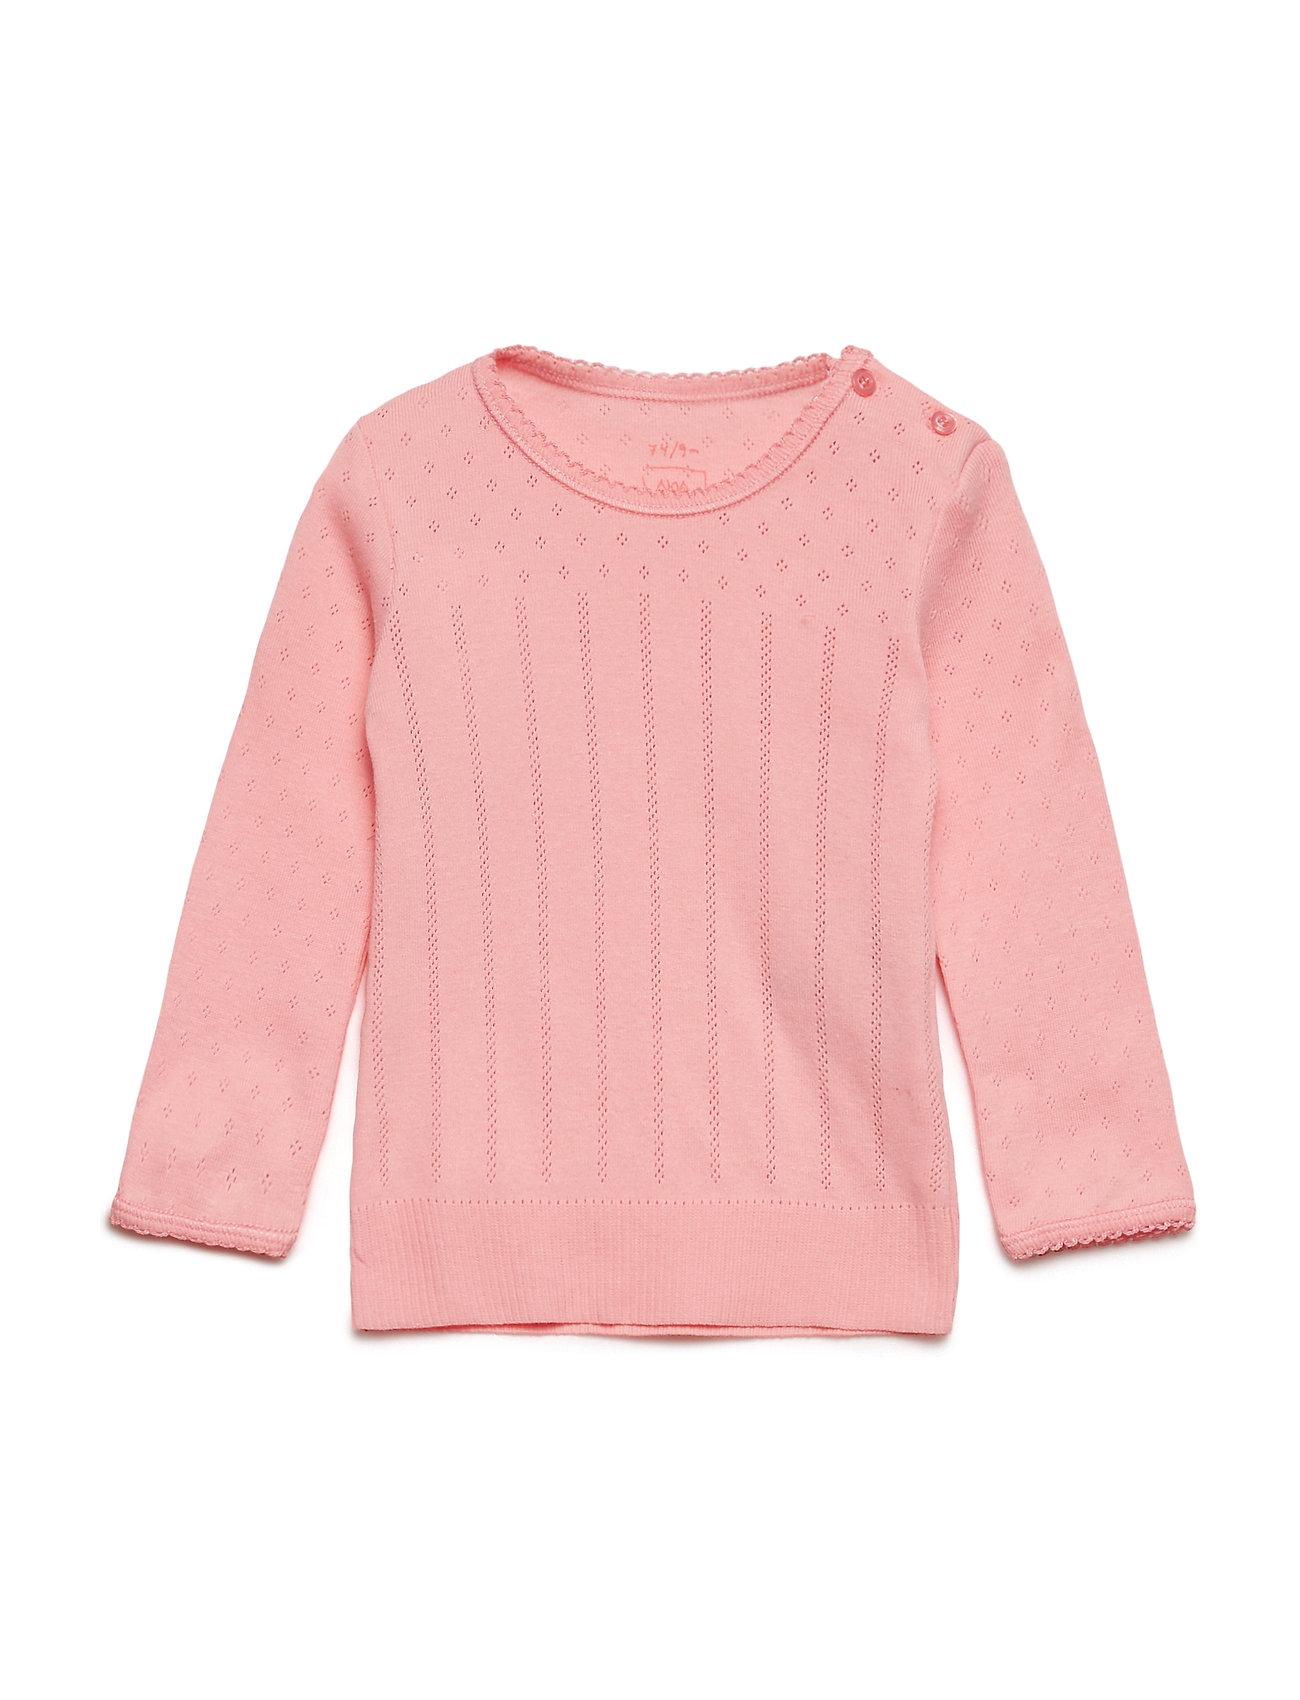 Noa Noa Miniature T-shirt - SALMON ROSE